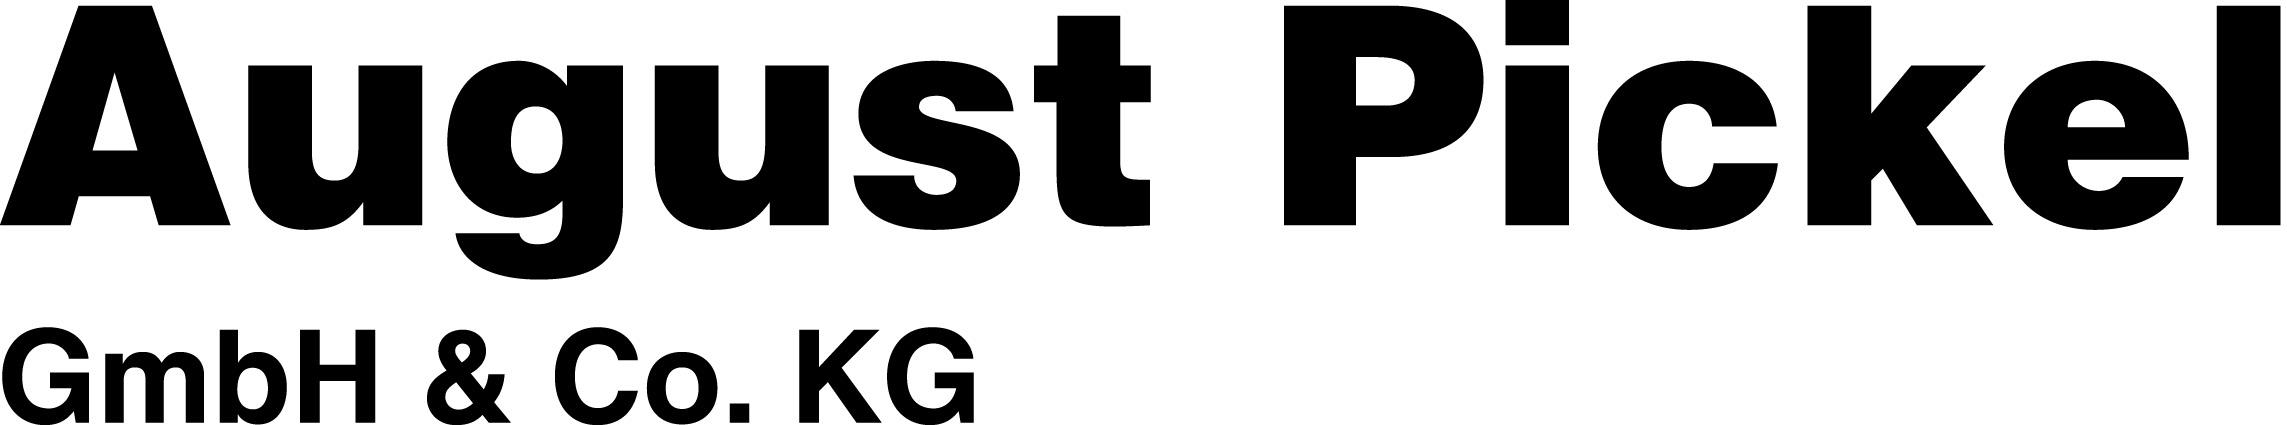 August Pickel GmbH & Co. KG